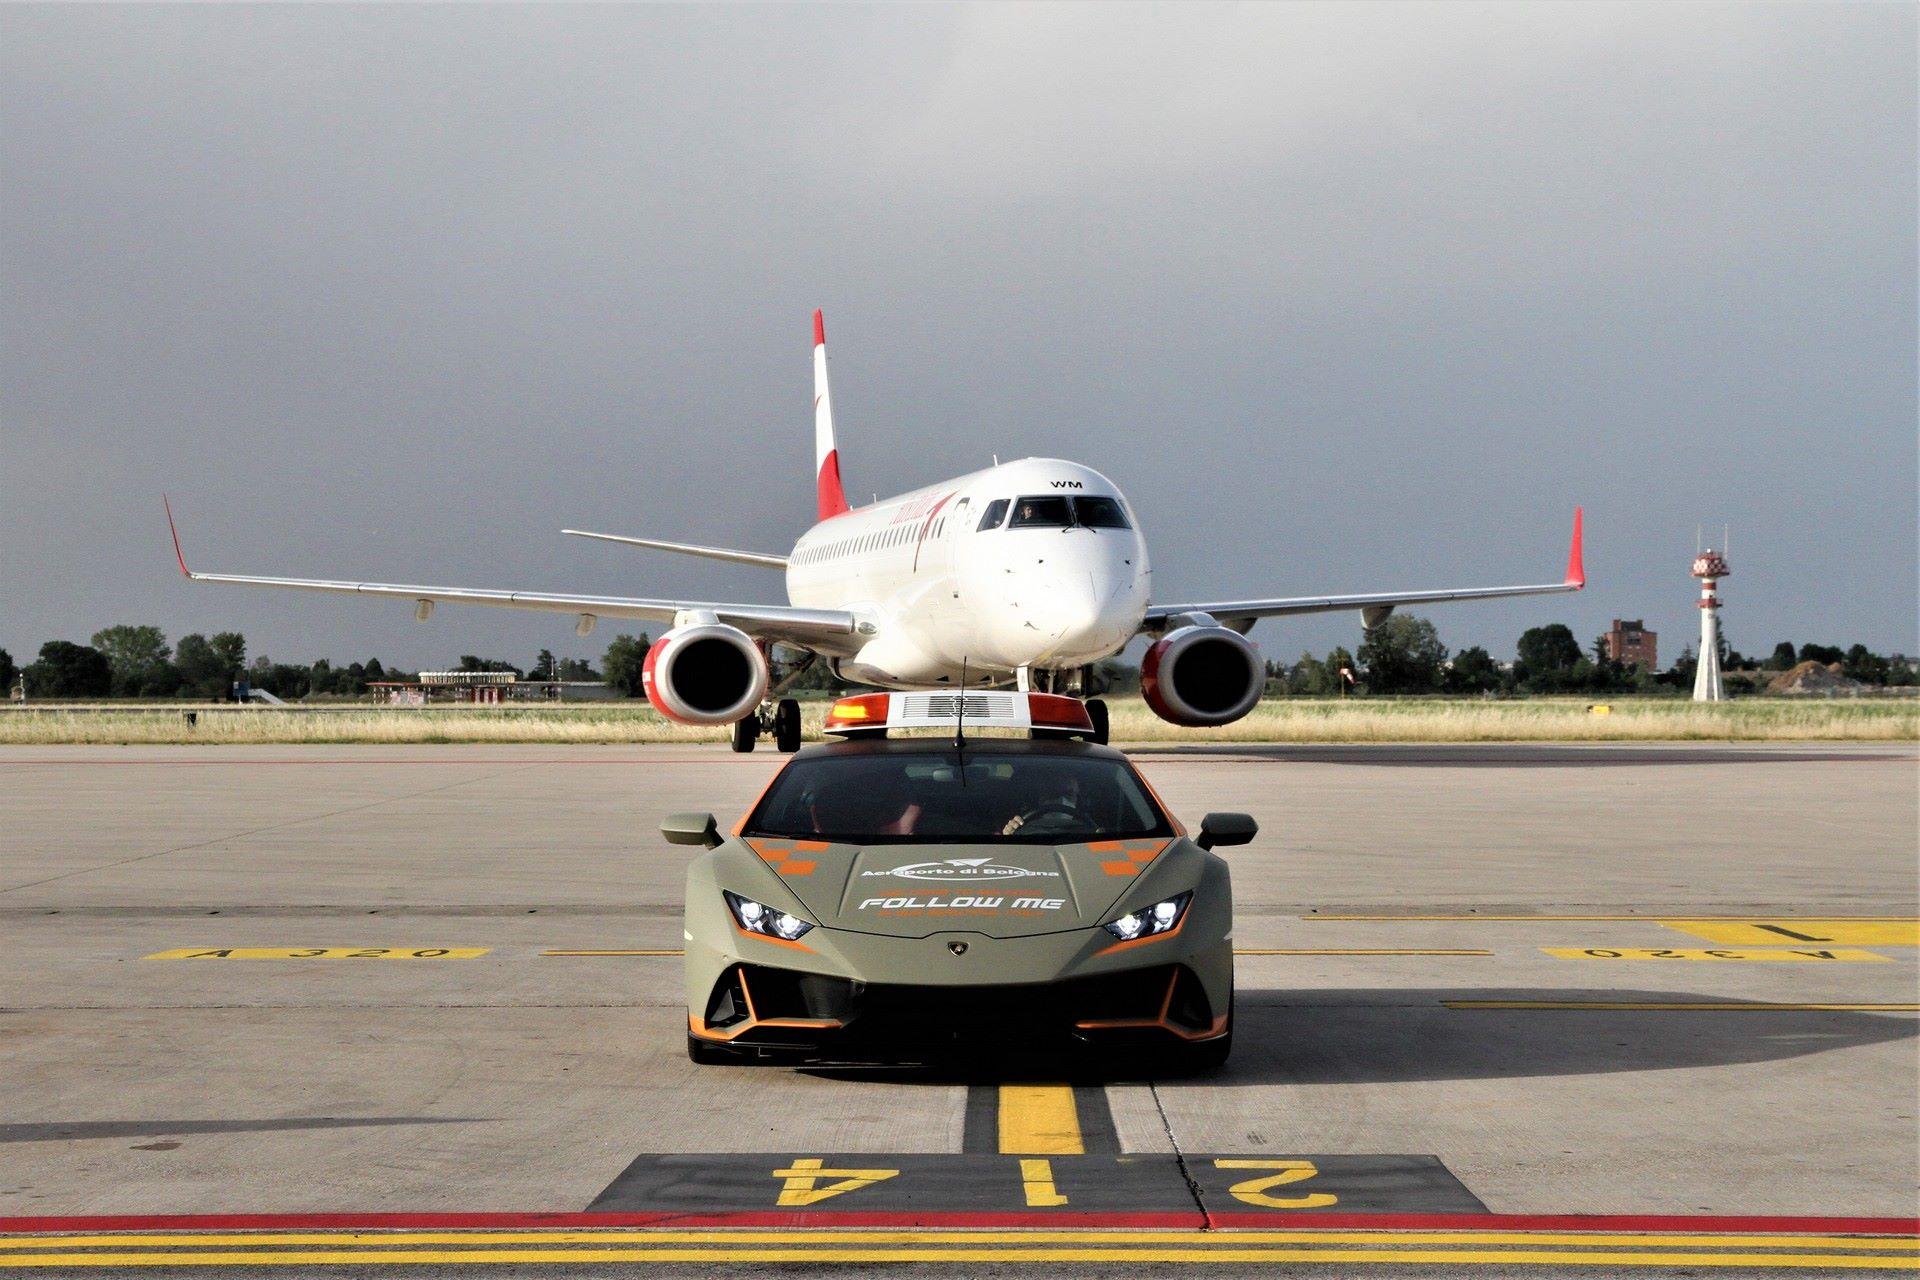 Lamborghini-Huracan-Evo-Follow-Me-bologna-airport-2021-12